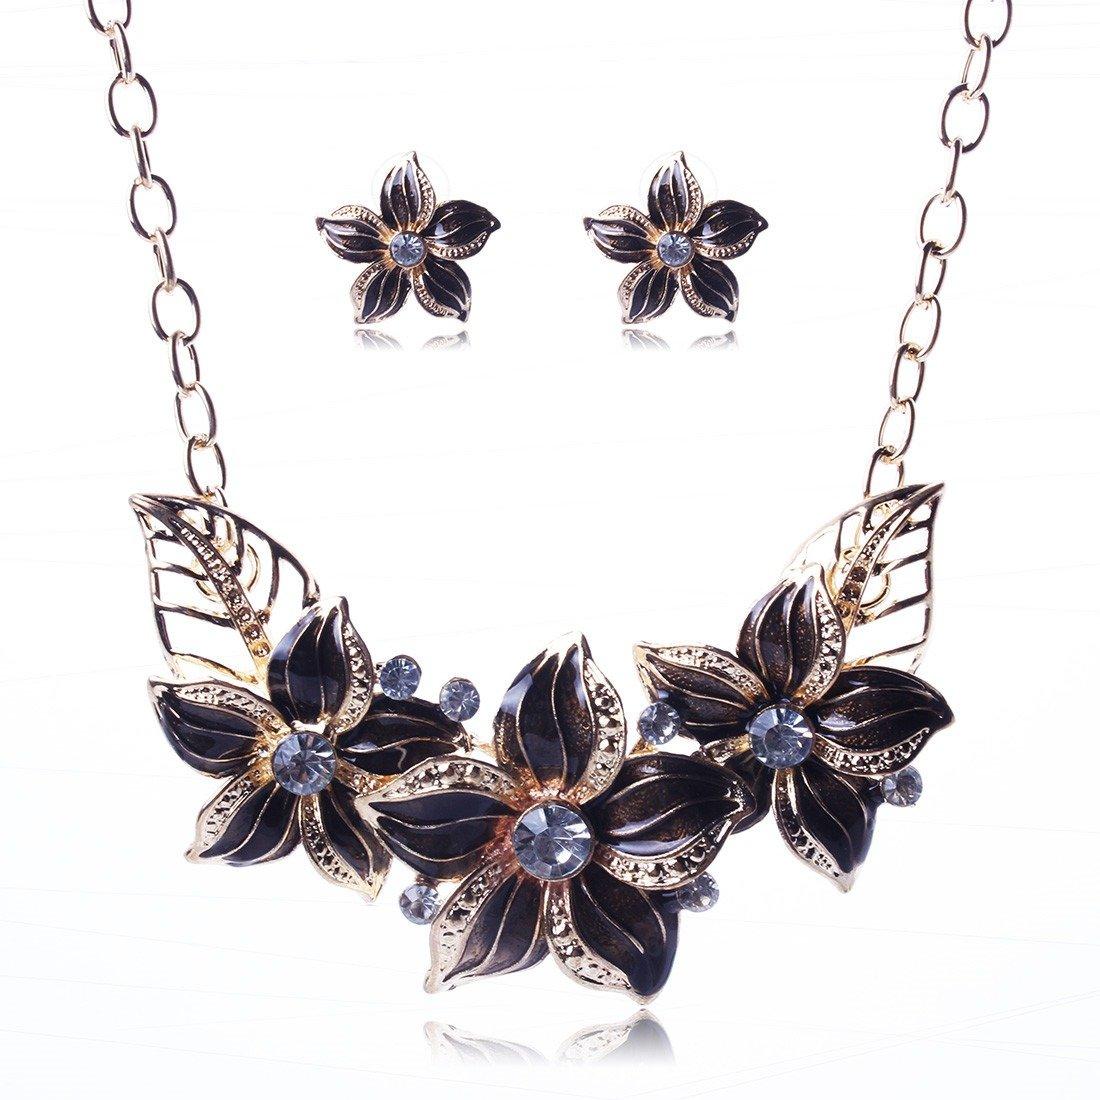 Qiyun blue 3 flower pendant necklace beautiful earrings popular 3 Fleurs Bleu Collier W005N1523